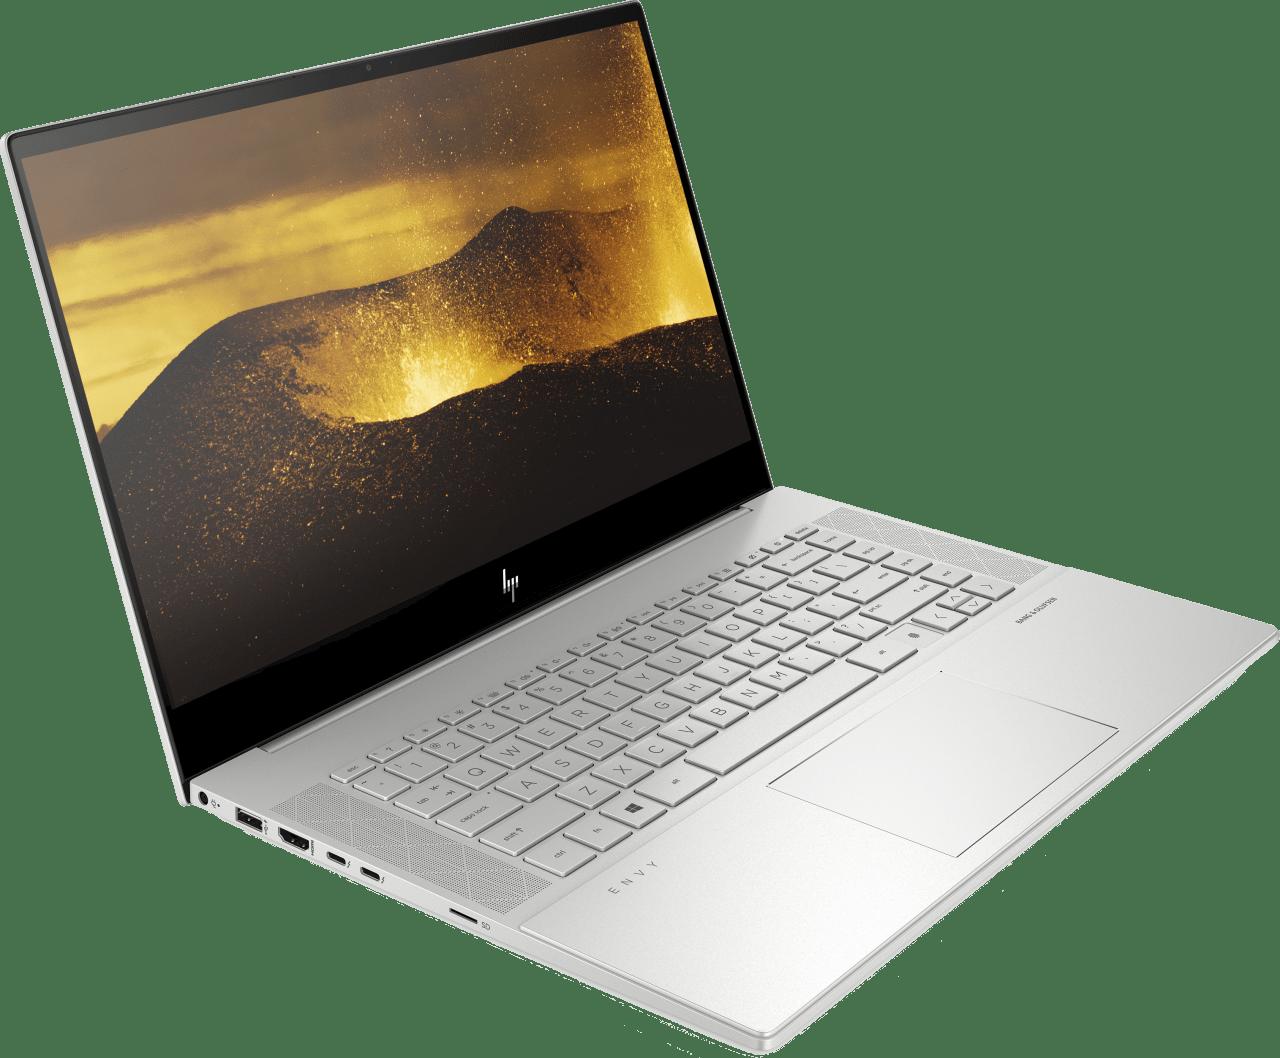 Natural Silver HP Envy Creators 15-ep0060ng Laptop - Intel® Core™ i7-10750H - 16GB - 1TB PCIe - NVIDIA® GeForce® GTX™ 1660 Ti.2